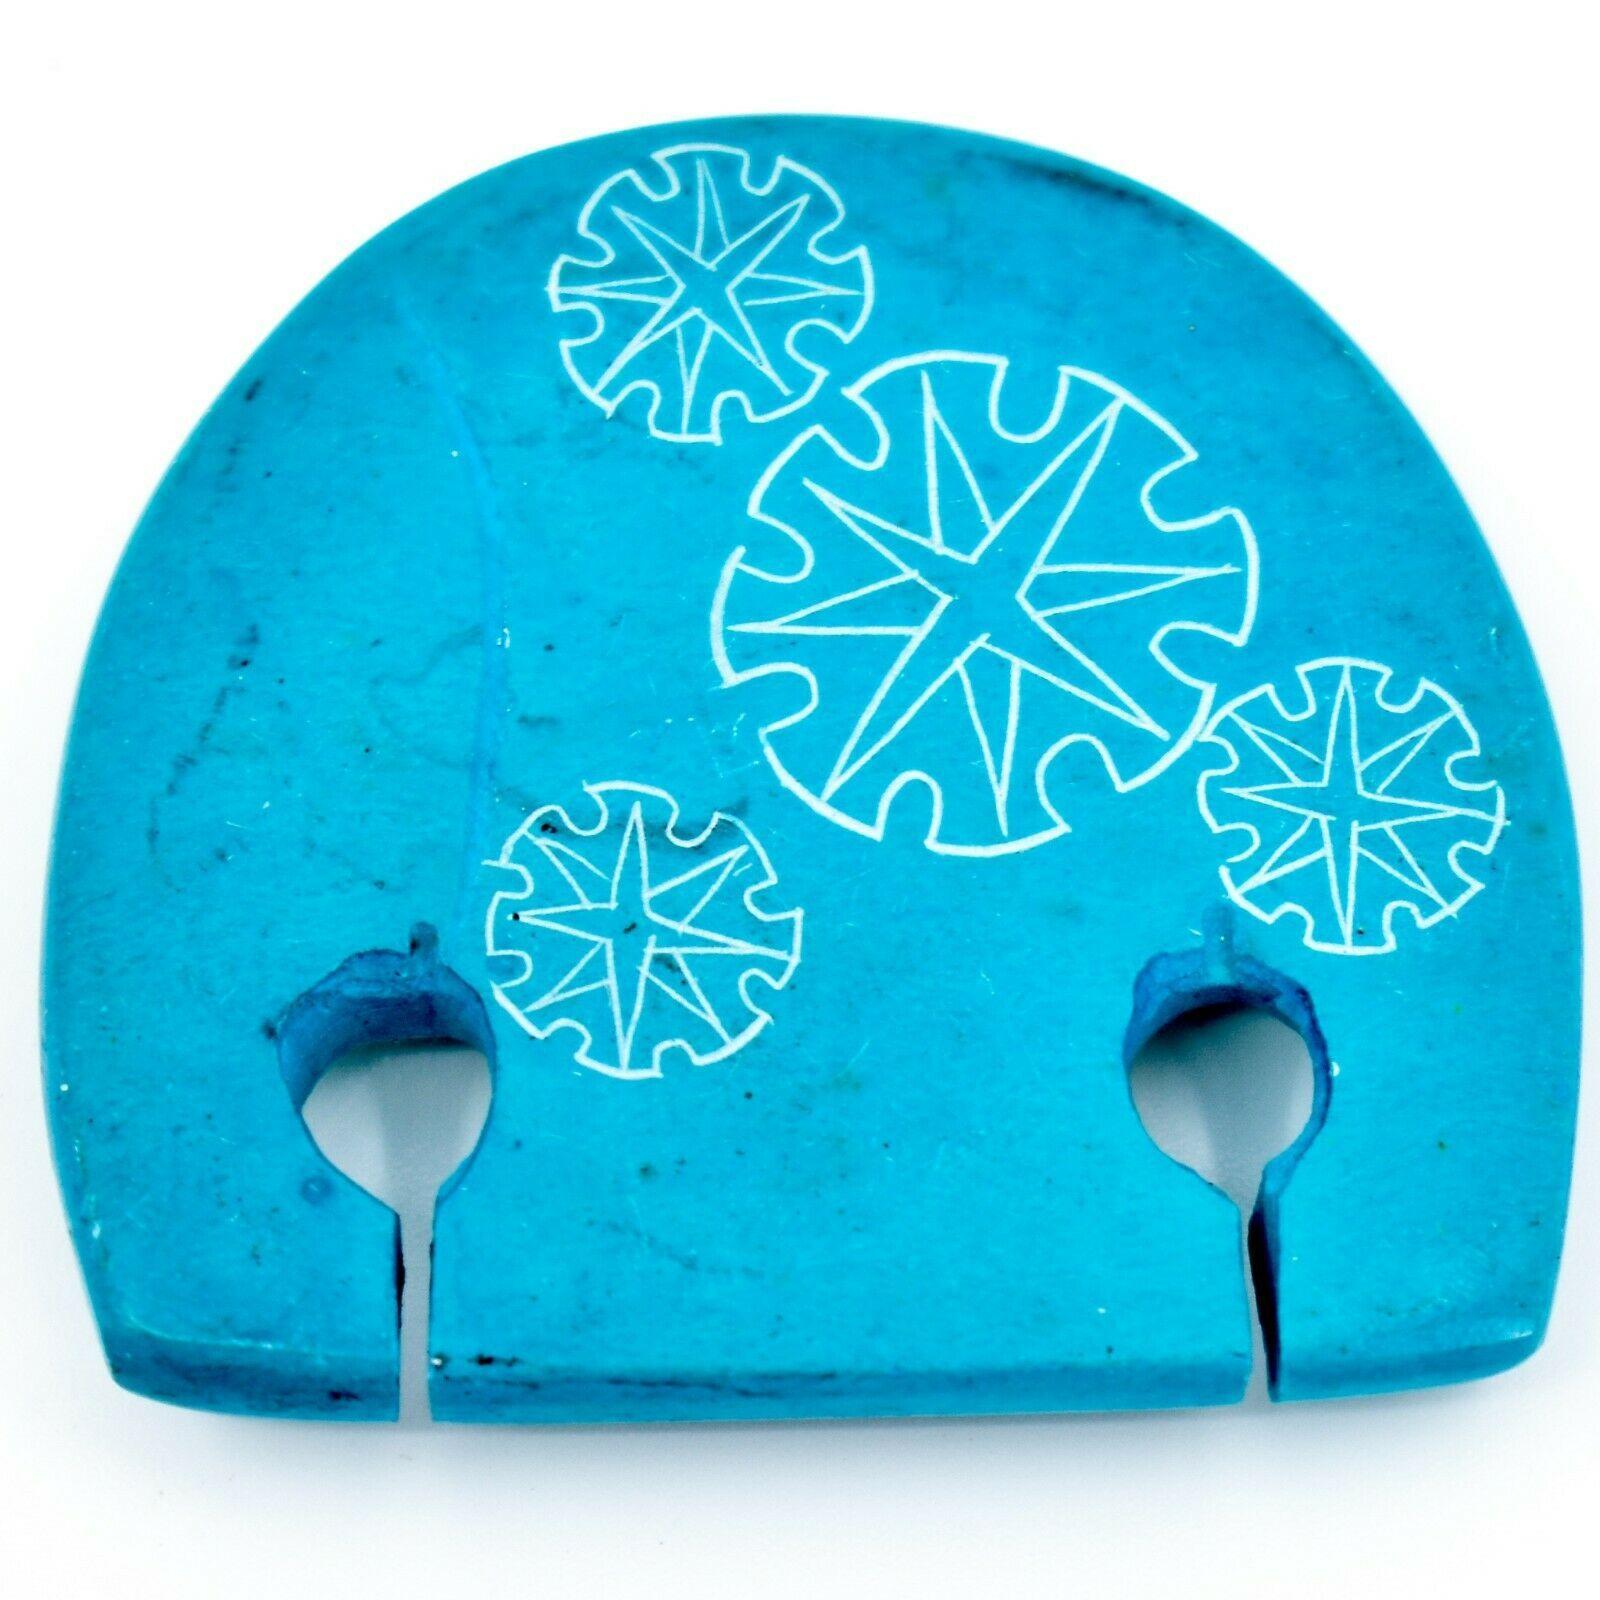 Hand Carved Soapstone Aqua Blue Simple Floral Elephant Fridge Magnet Made Kenya